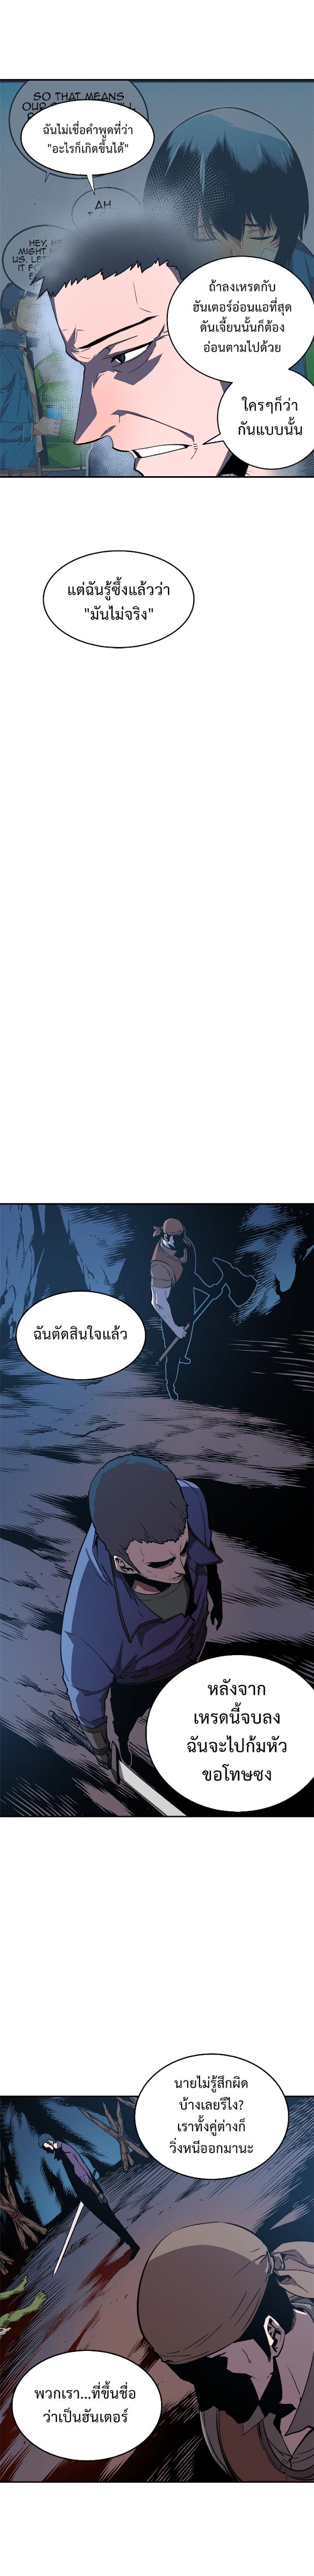 Solo Leveling ตอนที่ 29 TH แปลไทย